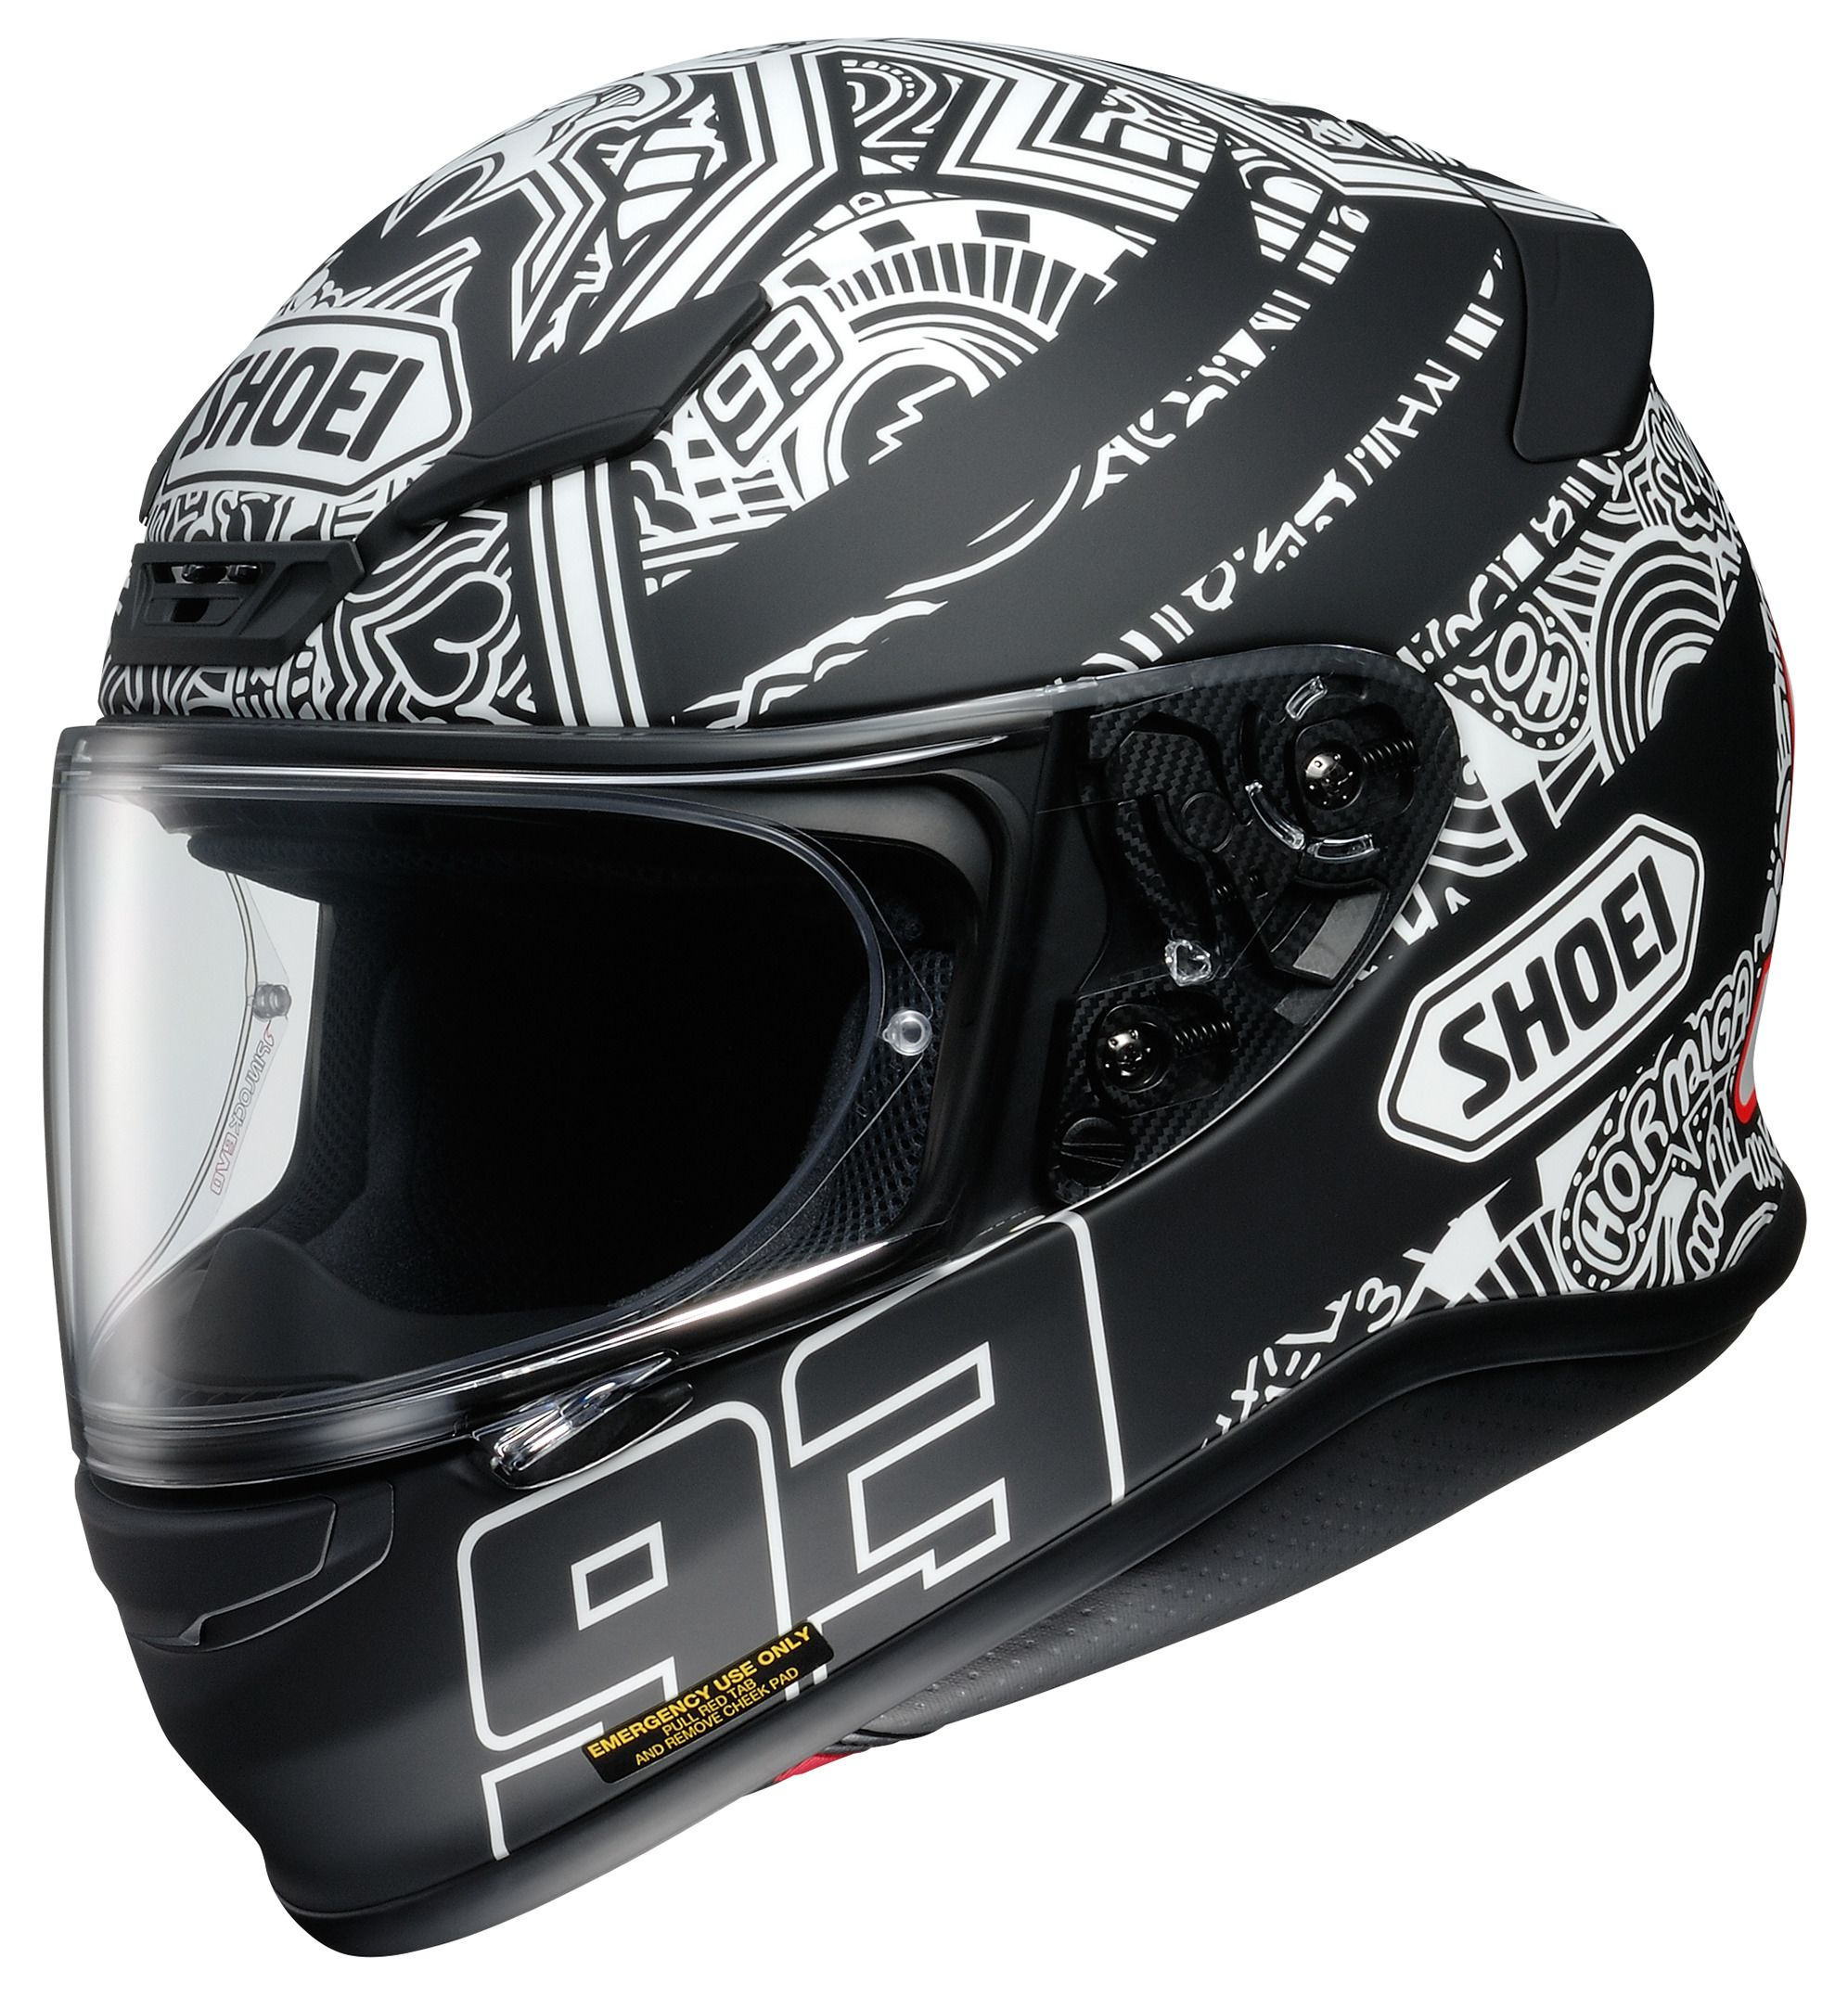 shoei rf 1200 marquez digi ant helmet revzilla. Black Bedroom Furniture Sets. Home Design Ideas